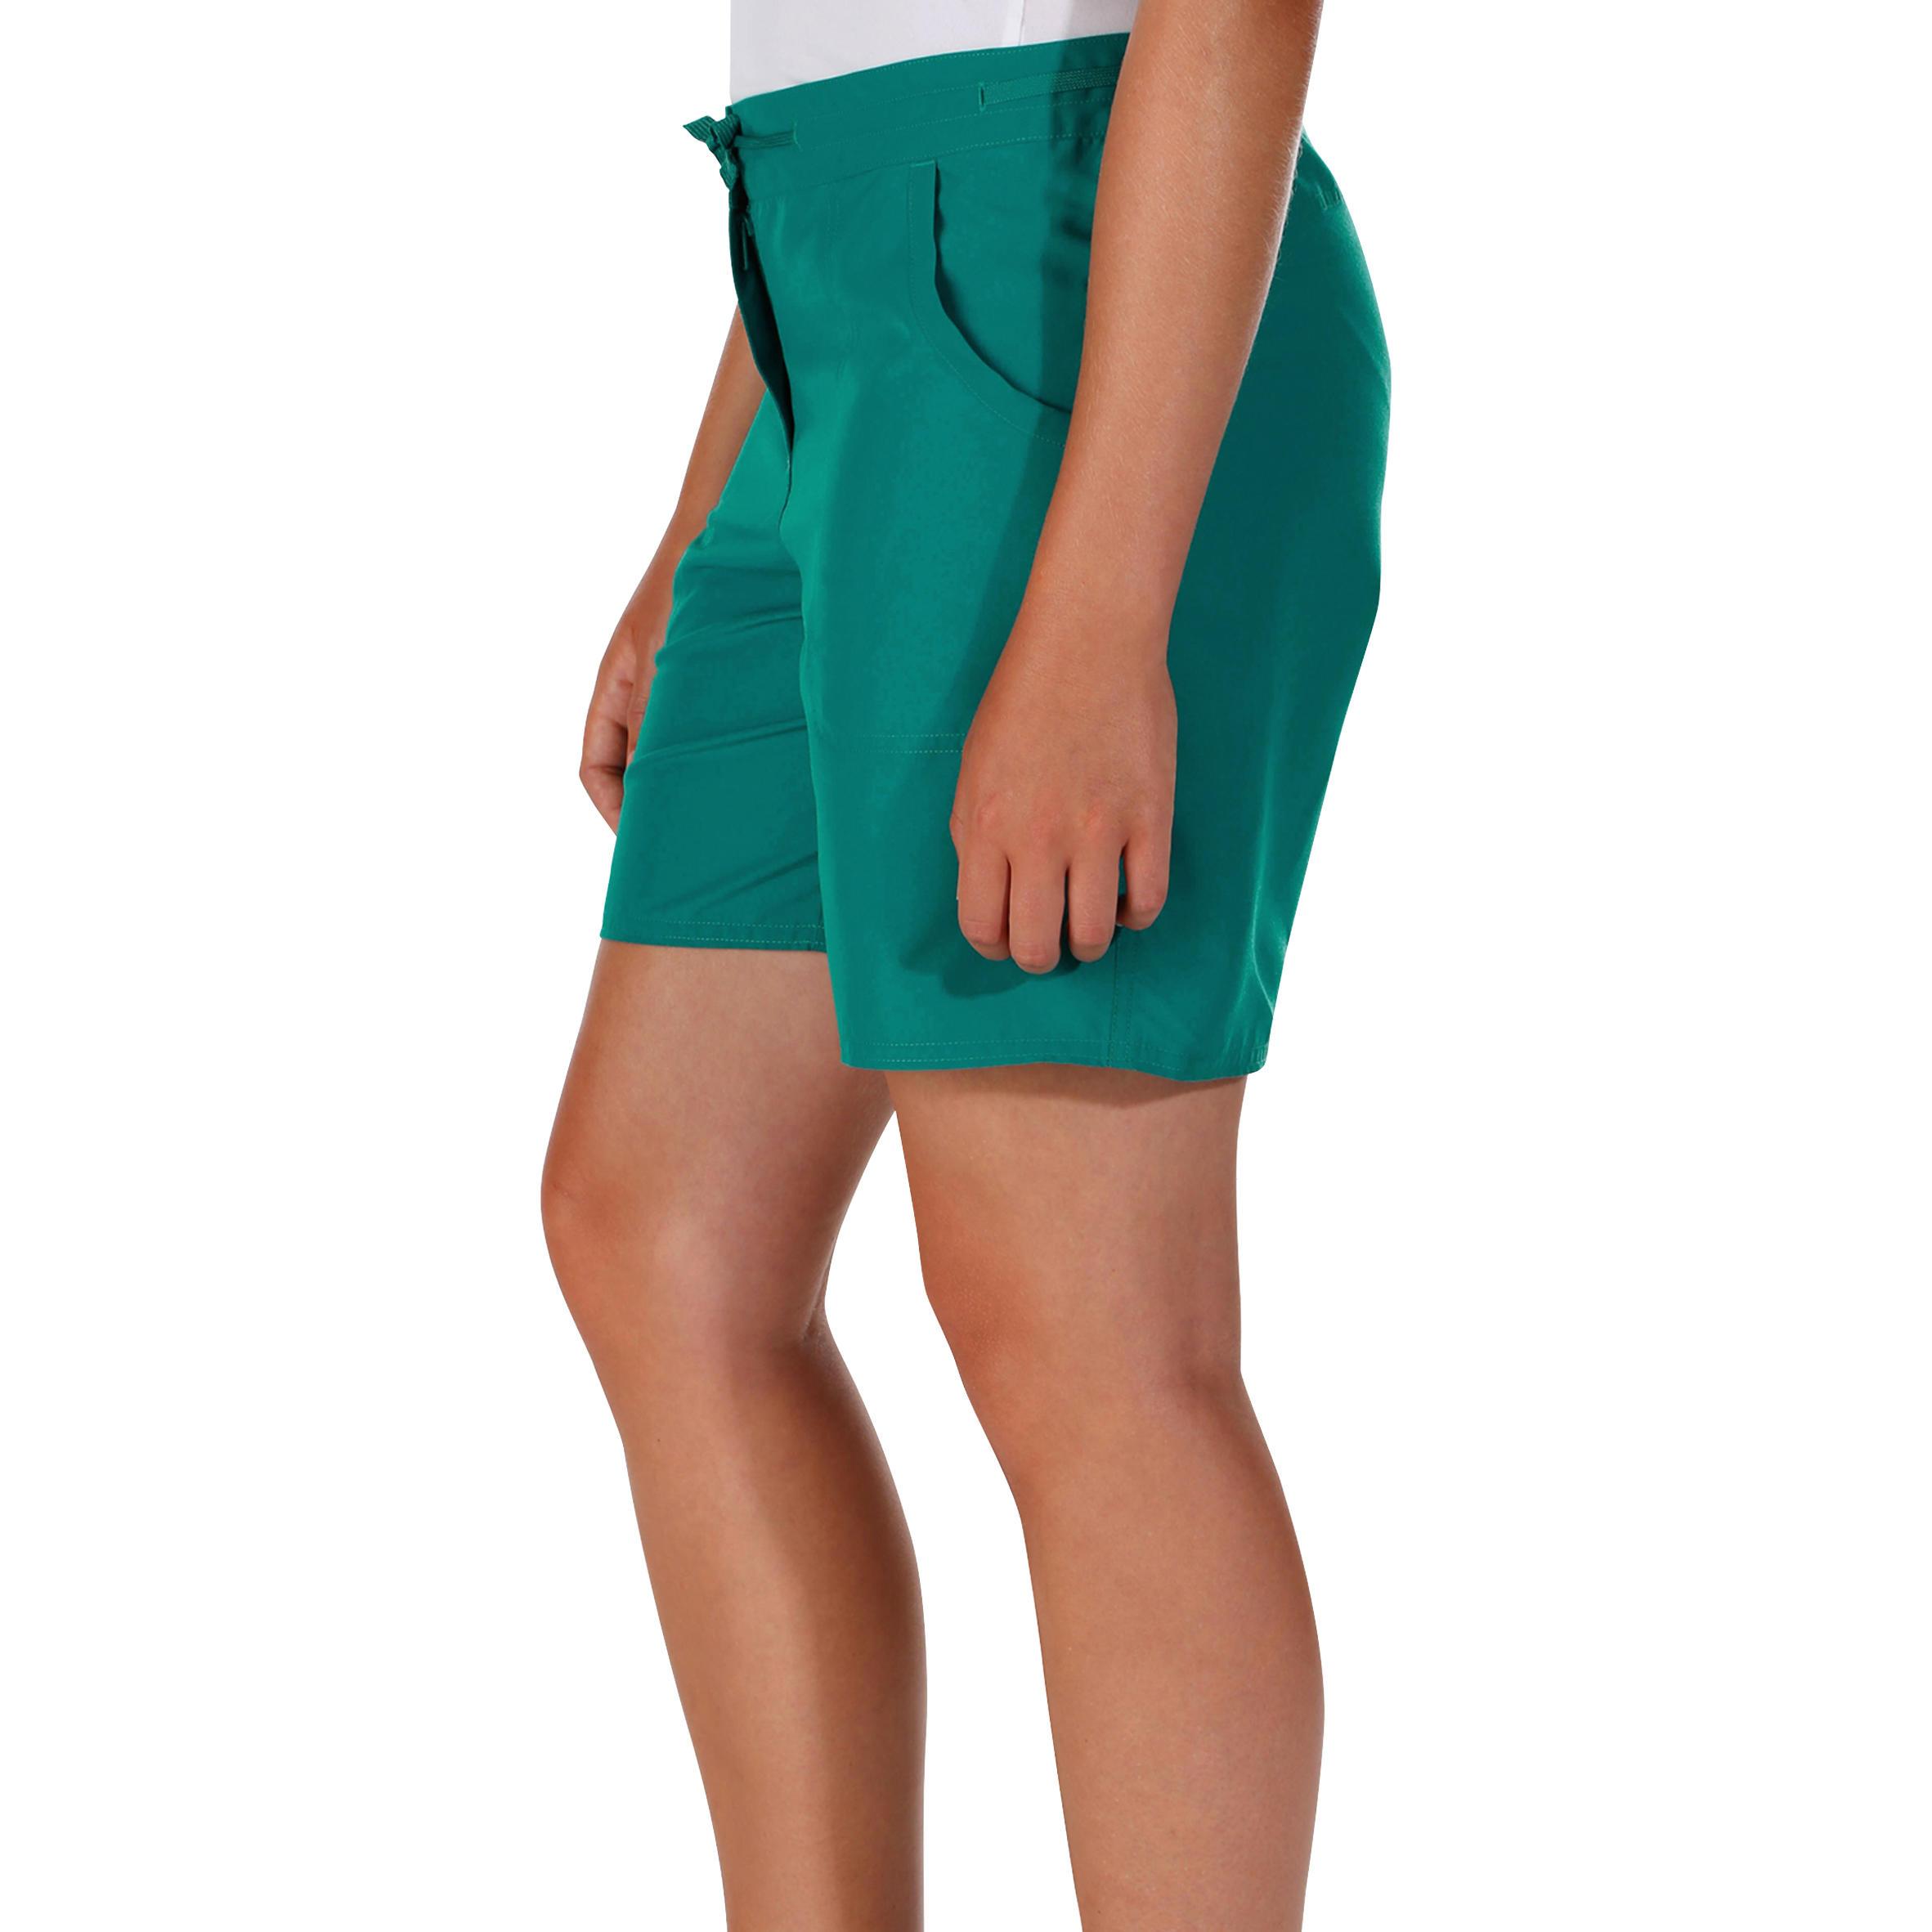 Women's Hiking Shorts Forclaz 50 - Dark Green